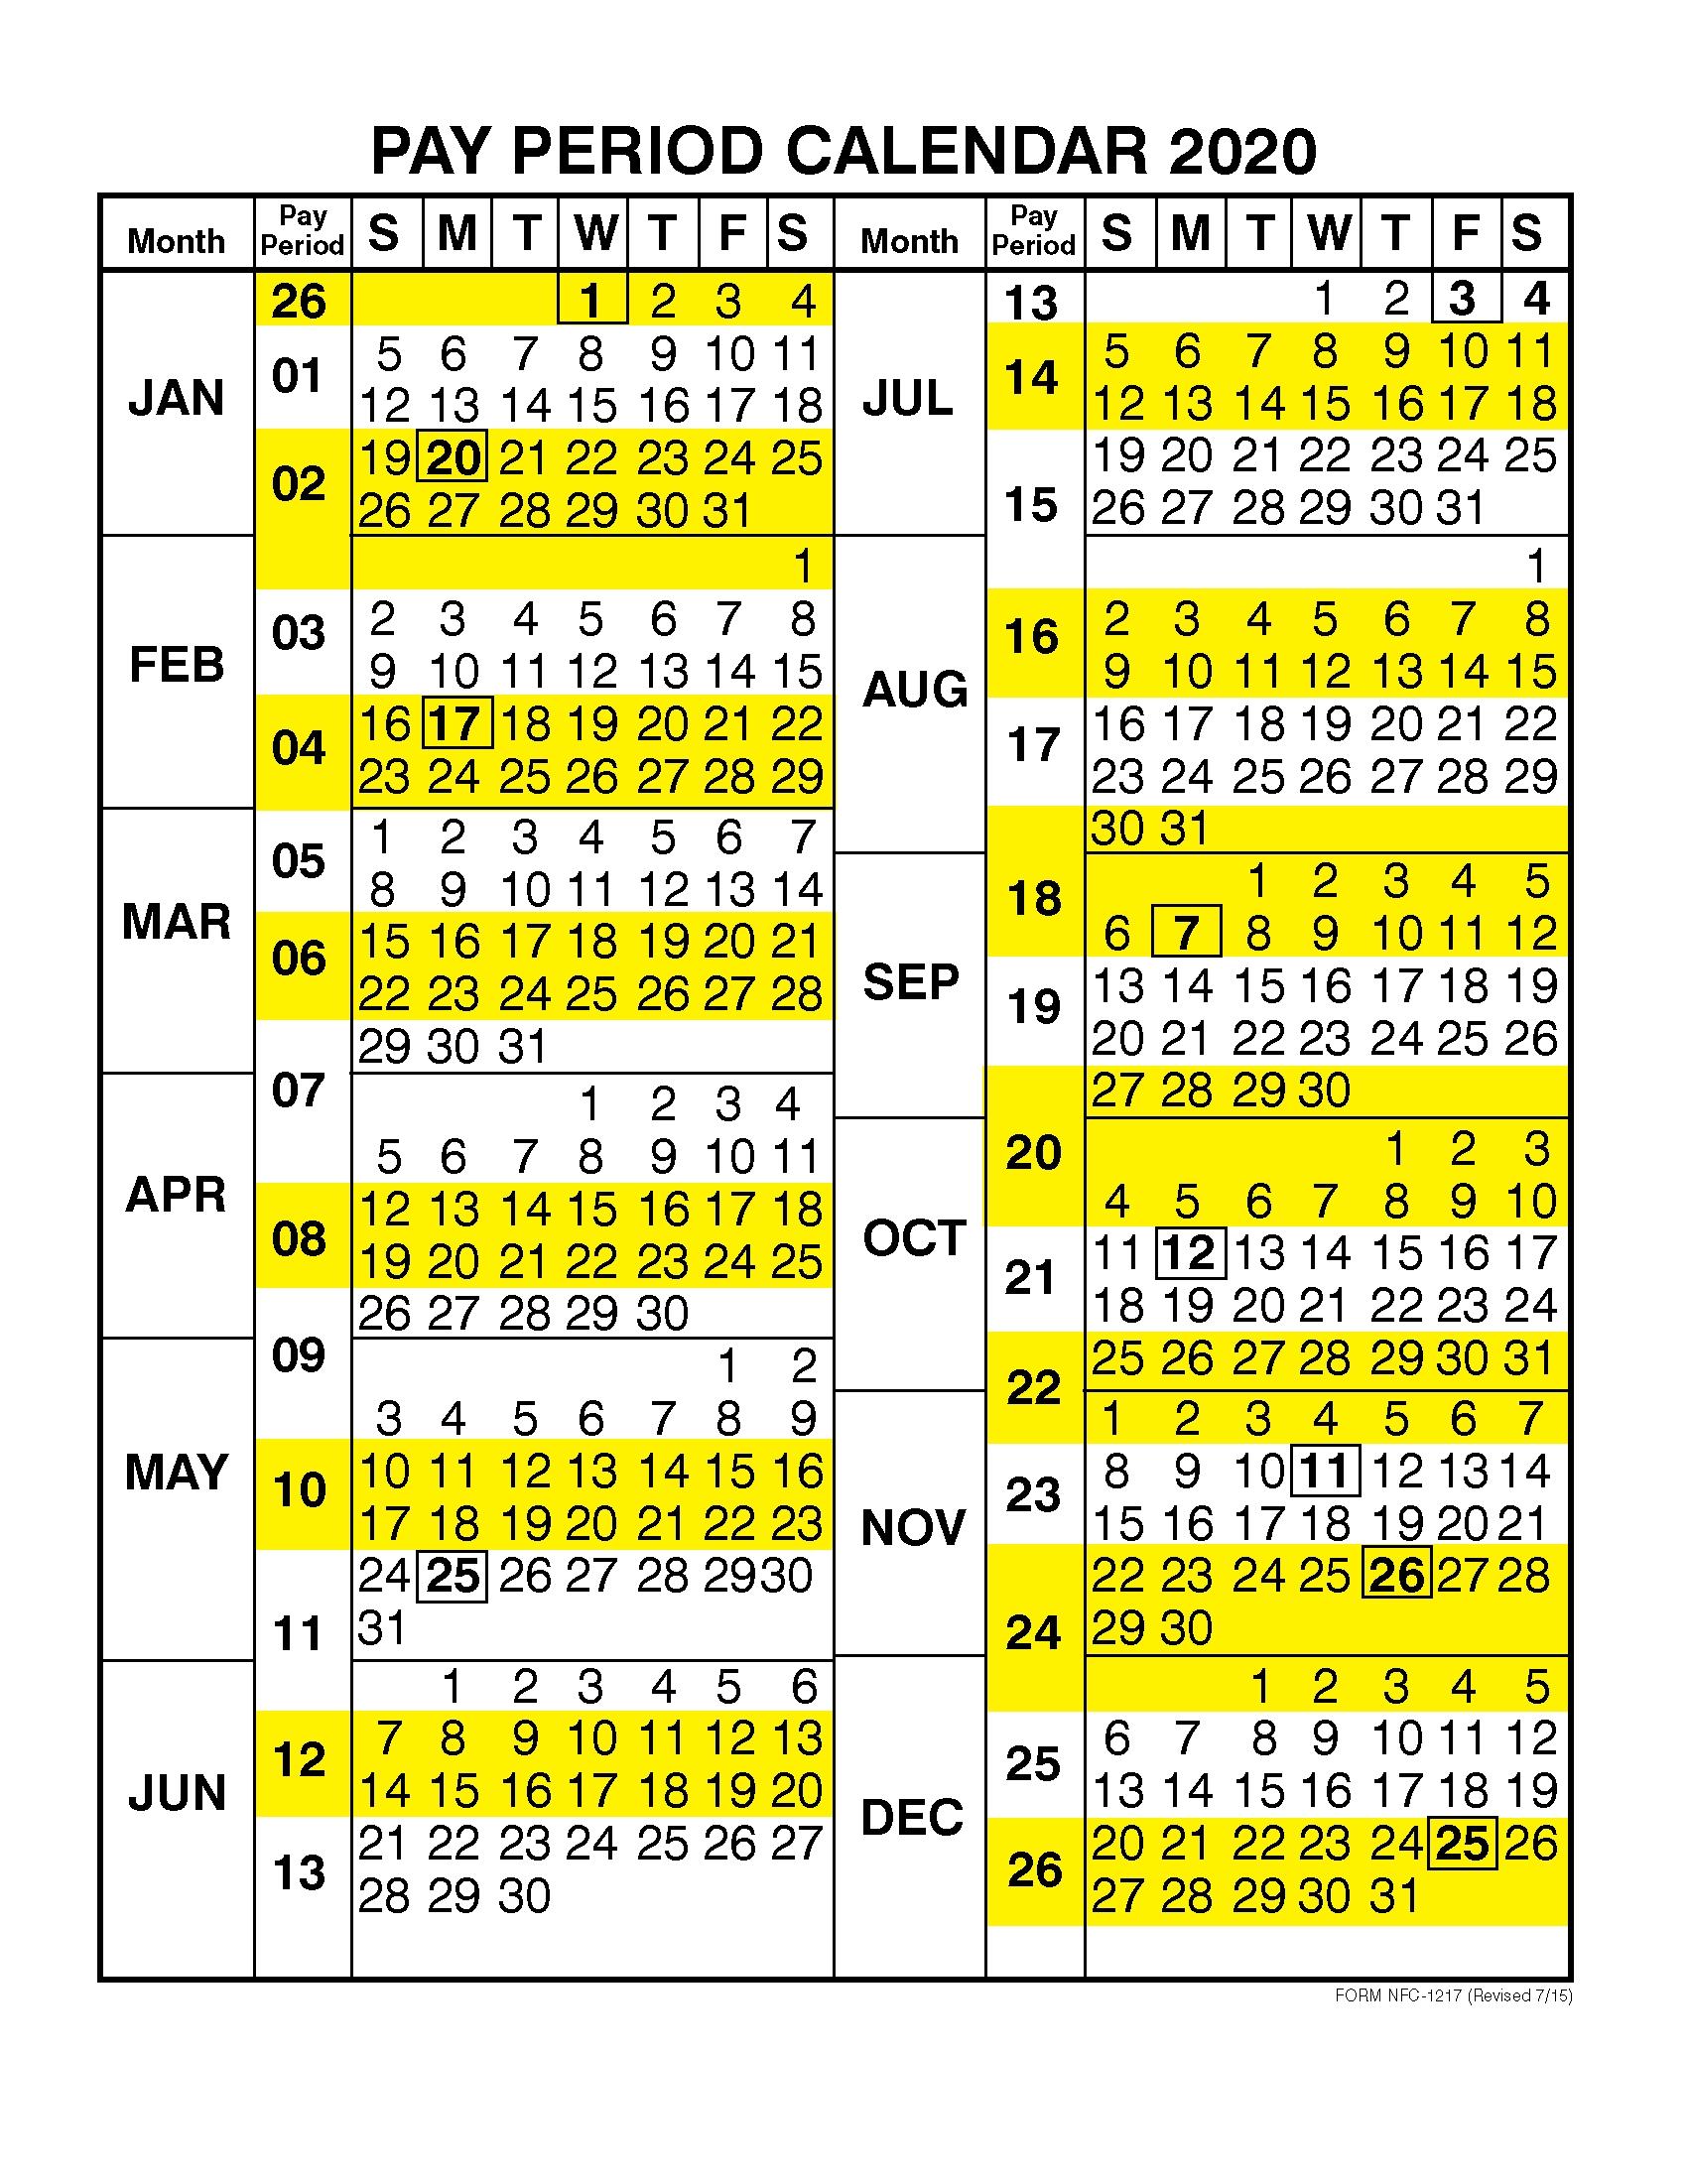 Dfas Payroll Calendar 2021 | 2021 Pay Periods Calendar